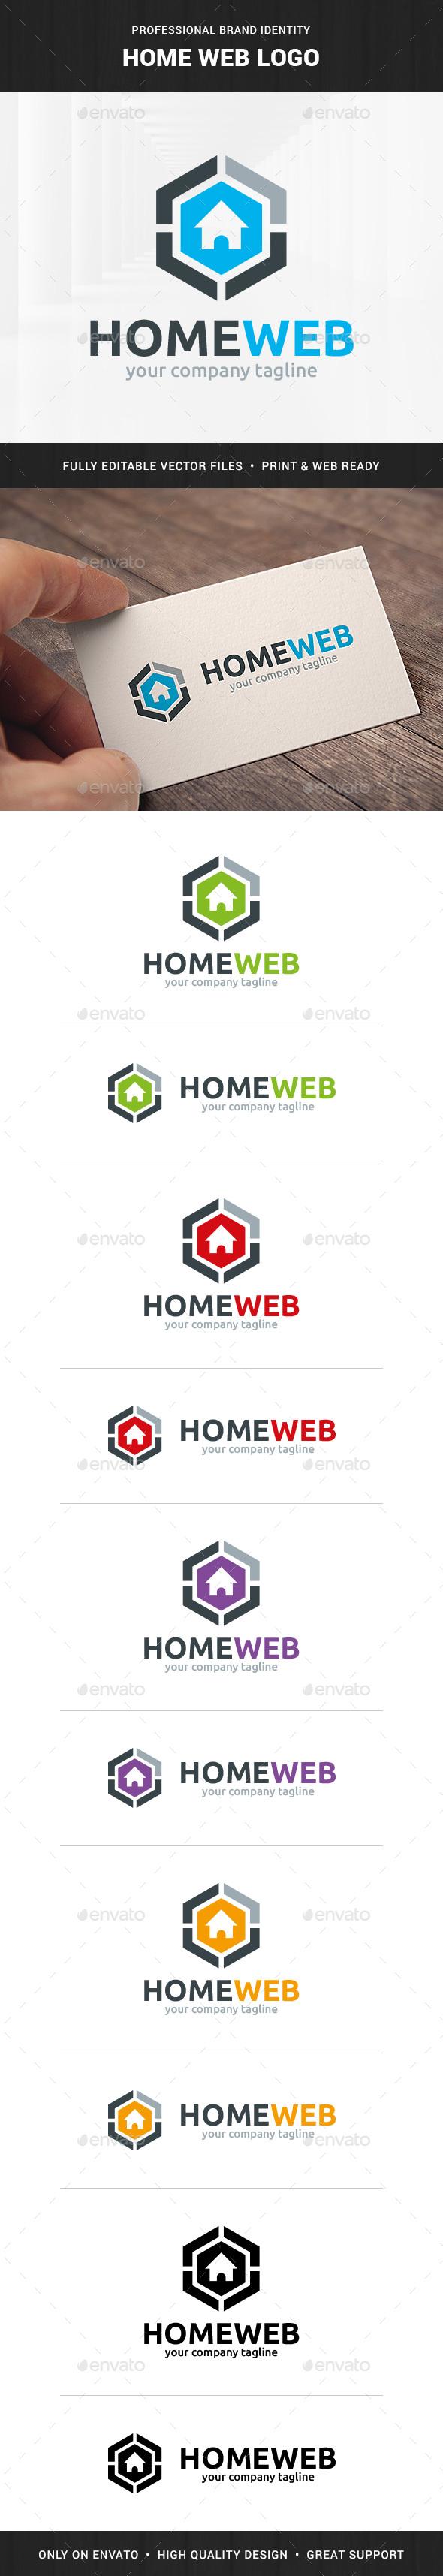 Home Web Logo Template - Buildings Logo Templates